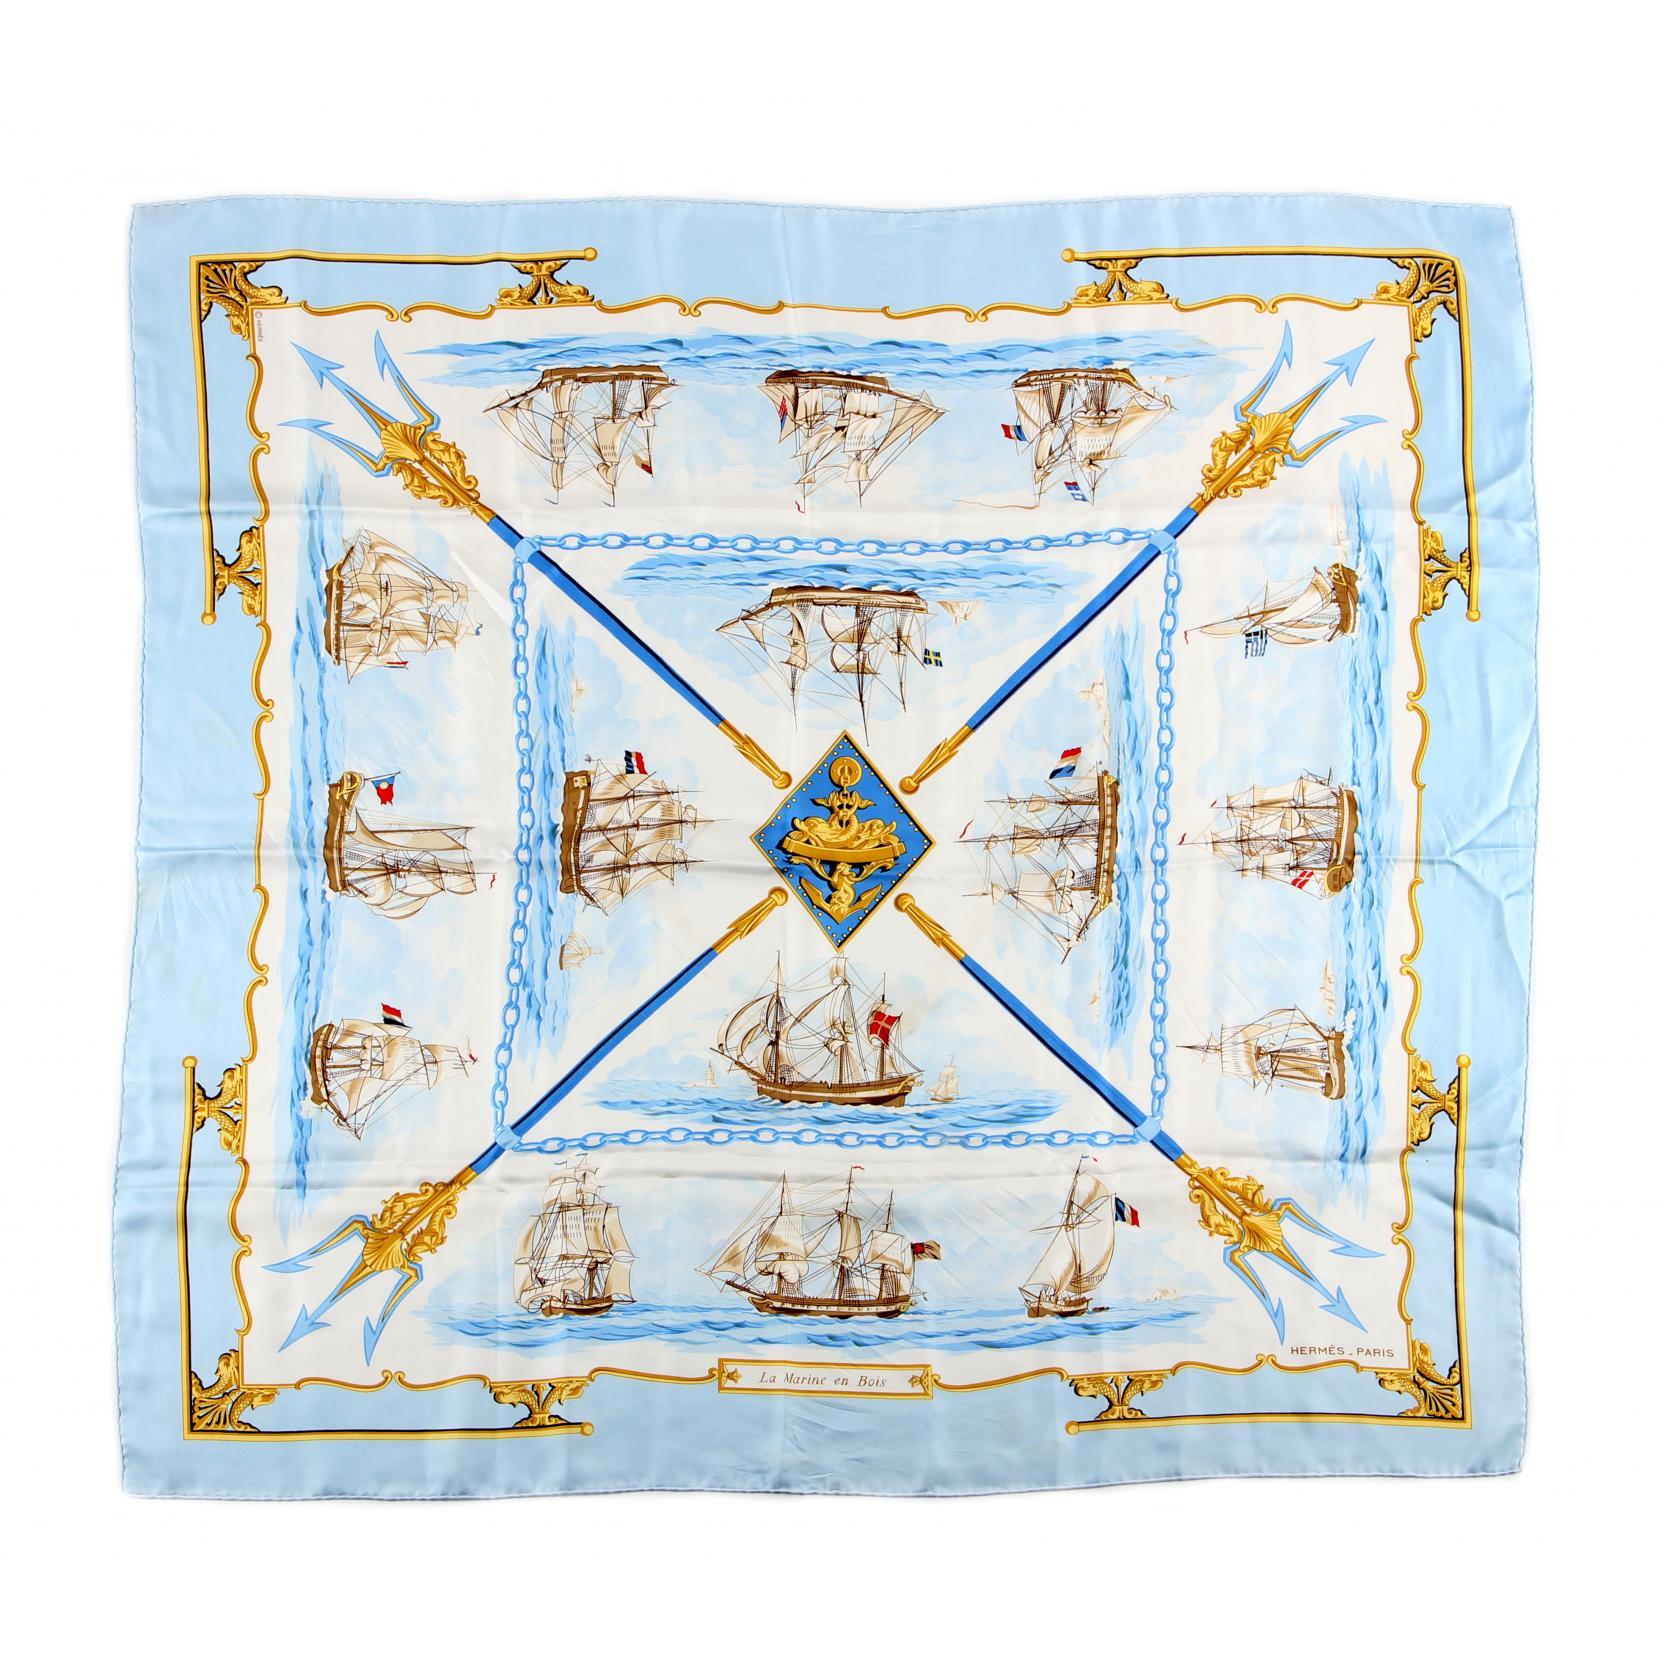 silk-scarf-la-marine-en-bois-hermes